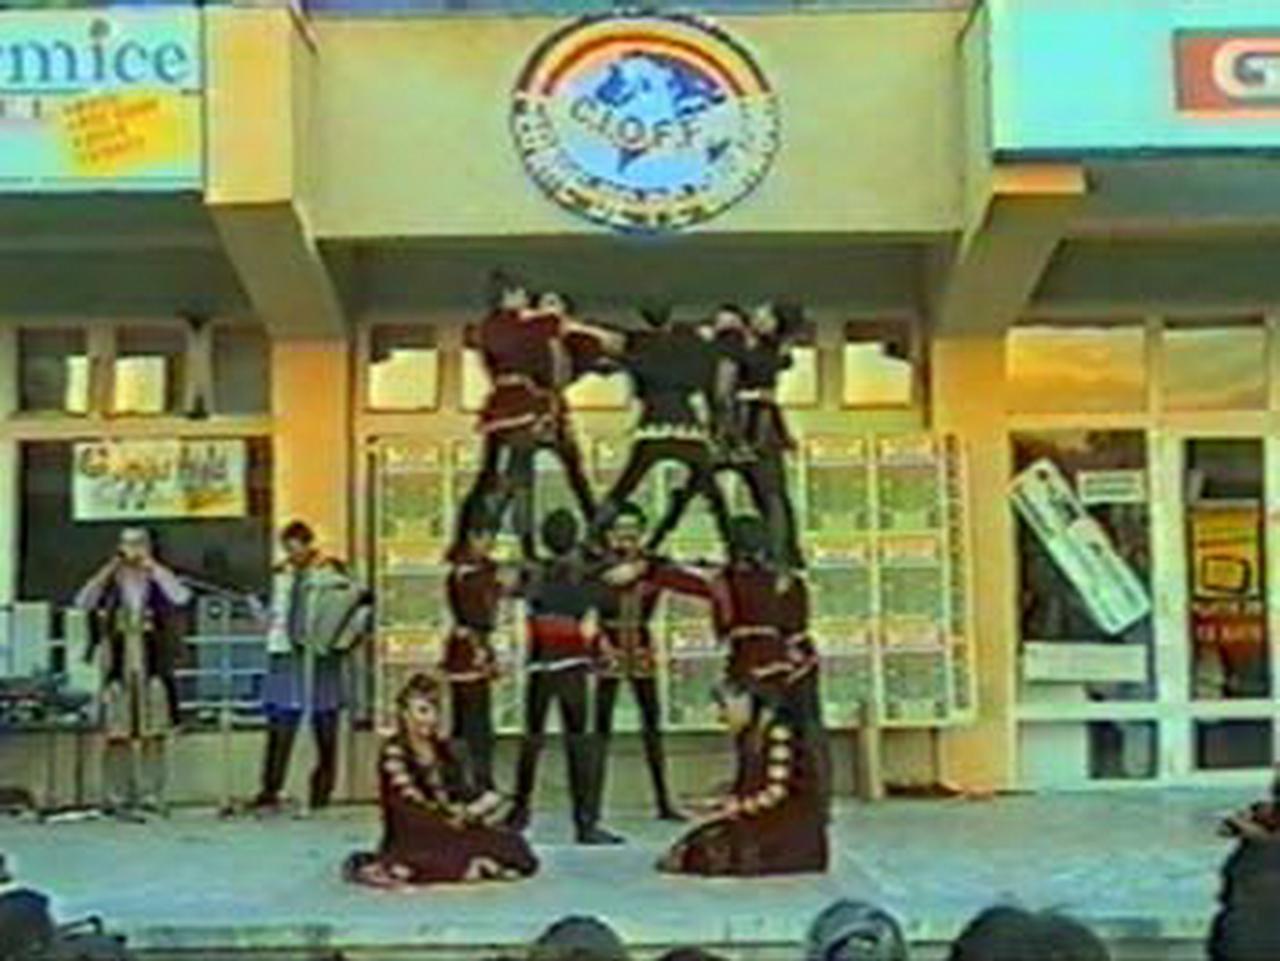 1997 - Ansamblul folcloric \'\'Masis\'\' - Armenia